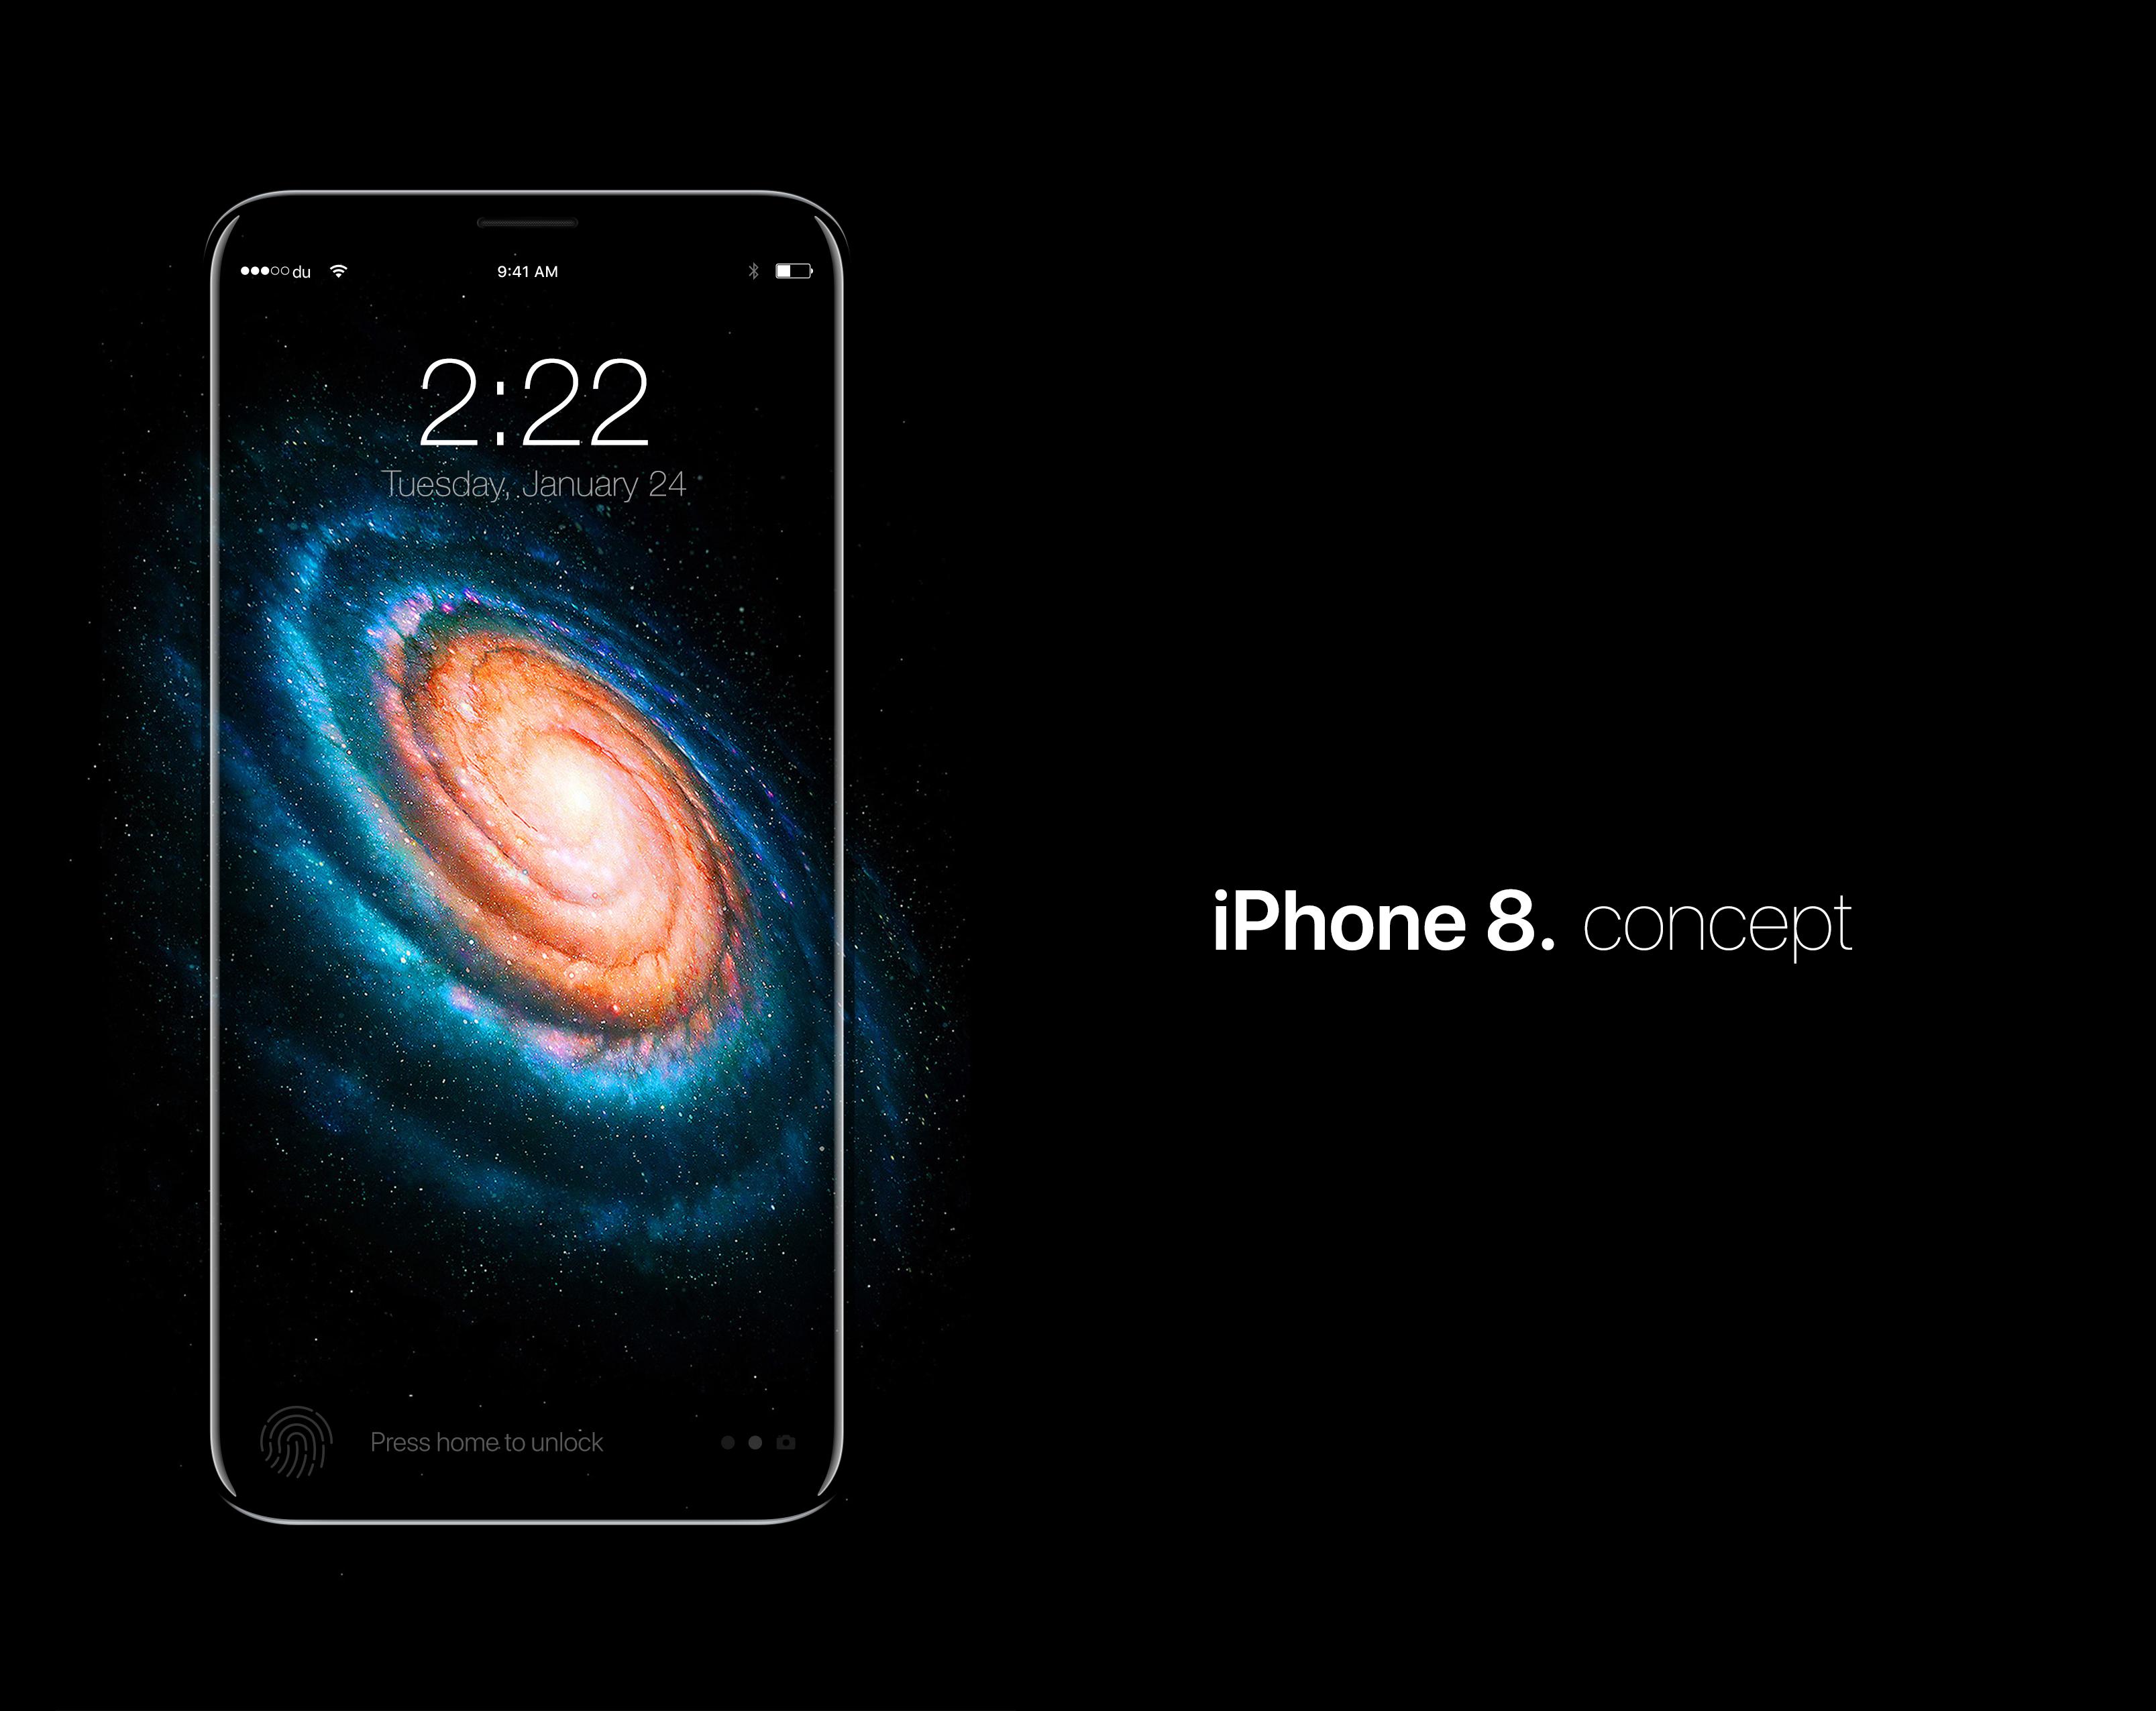 iPhone 8 Concept Iphone 8 concept, Iphone 8, Iphone